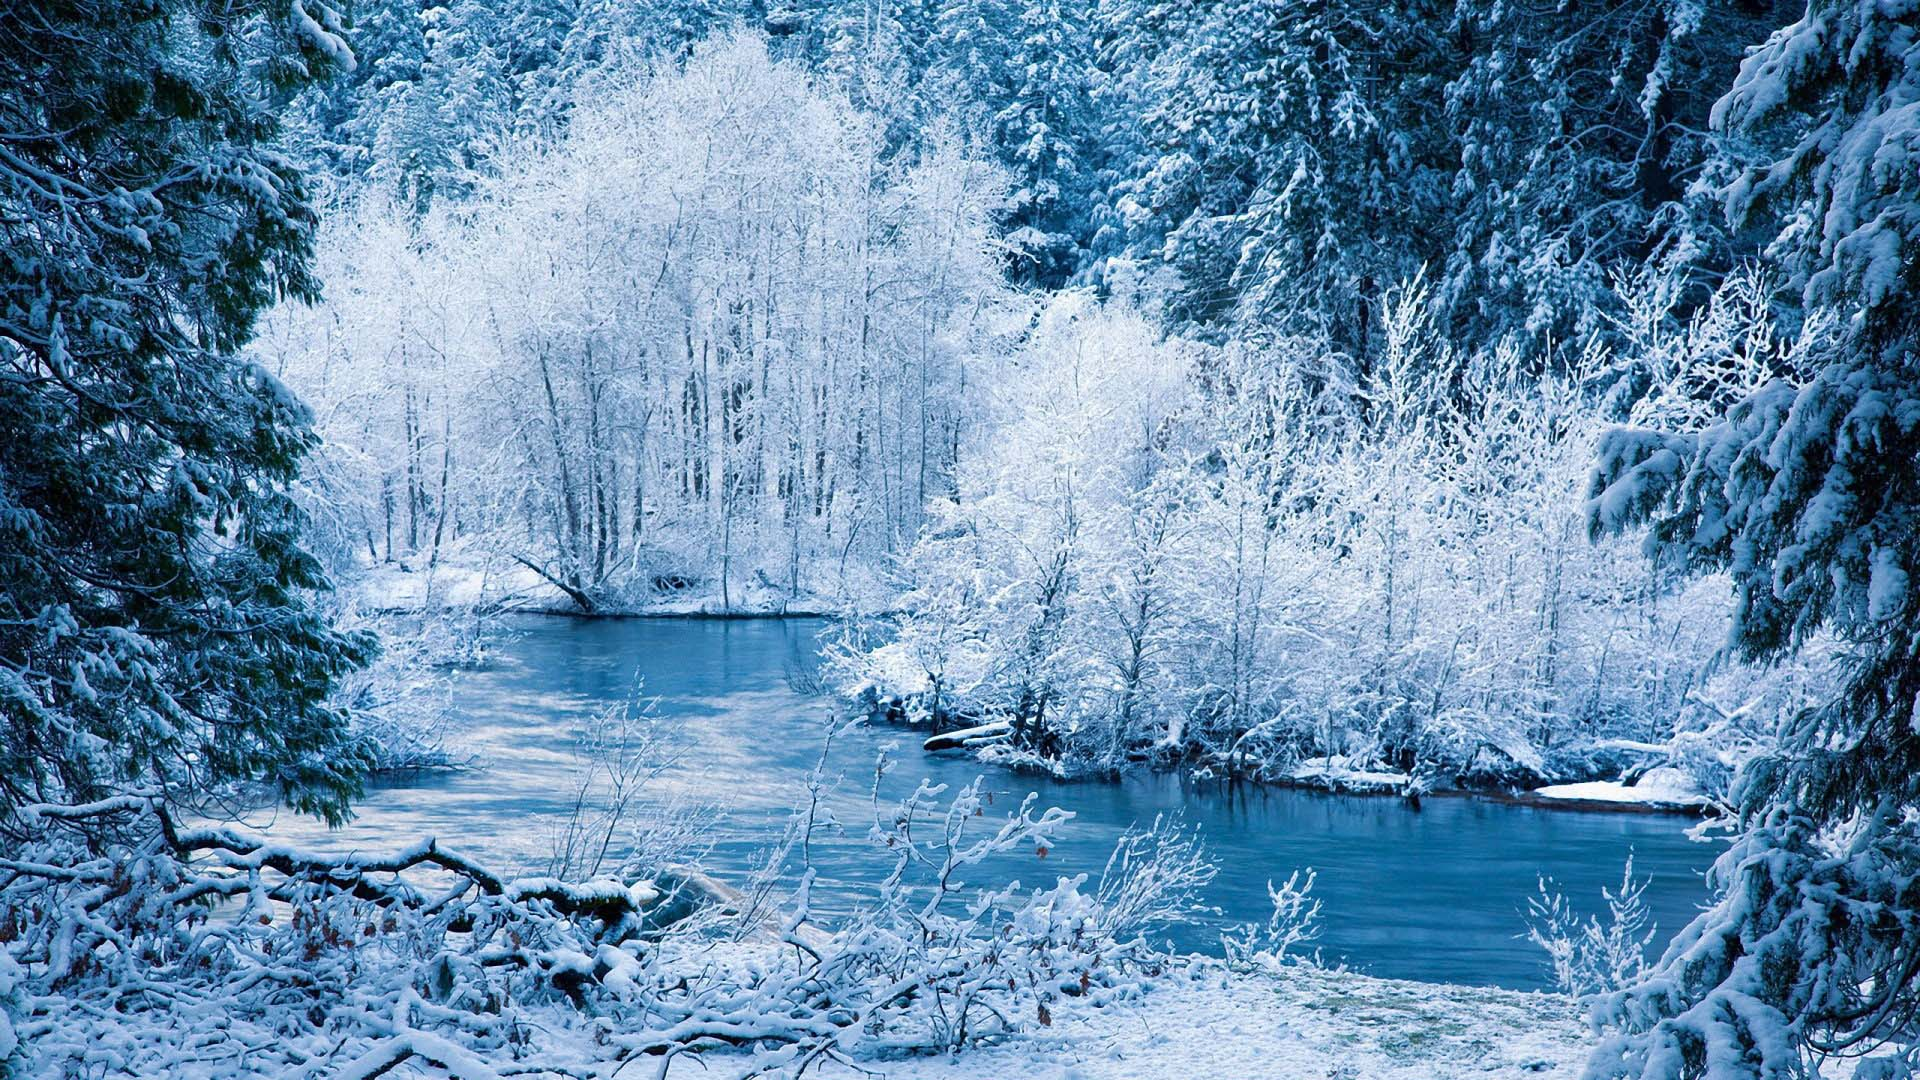 widescreen nature HD Winter Backgrounds